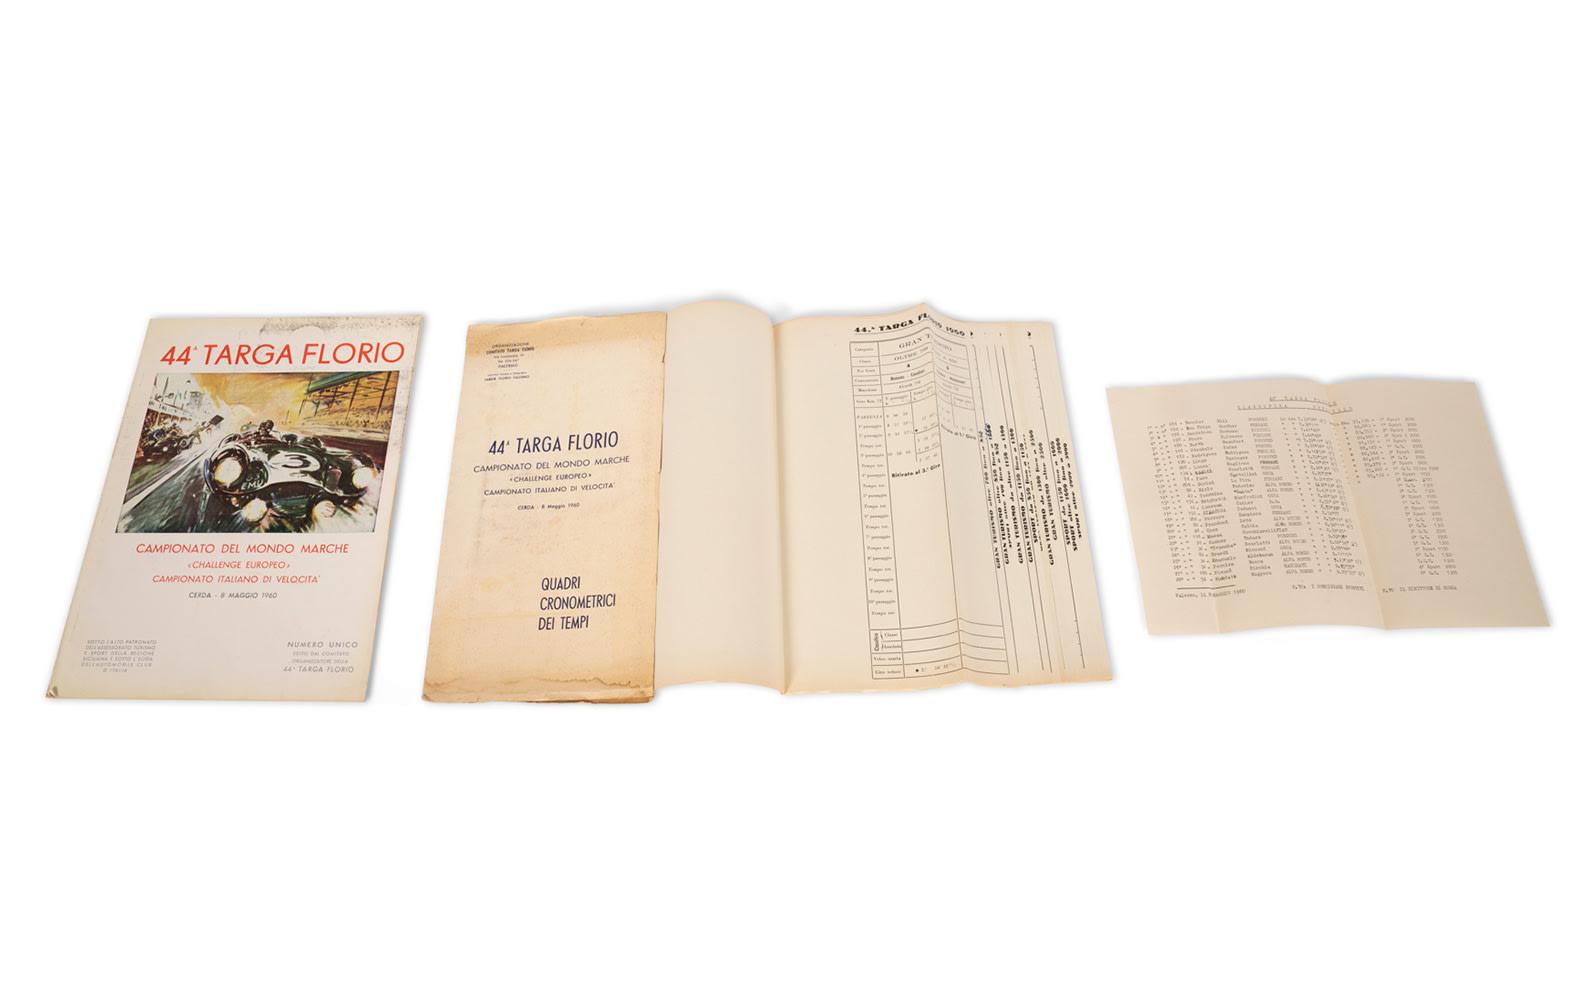 1960 Targa Florio Official Race Program and Timing Chart